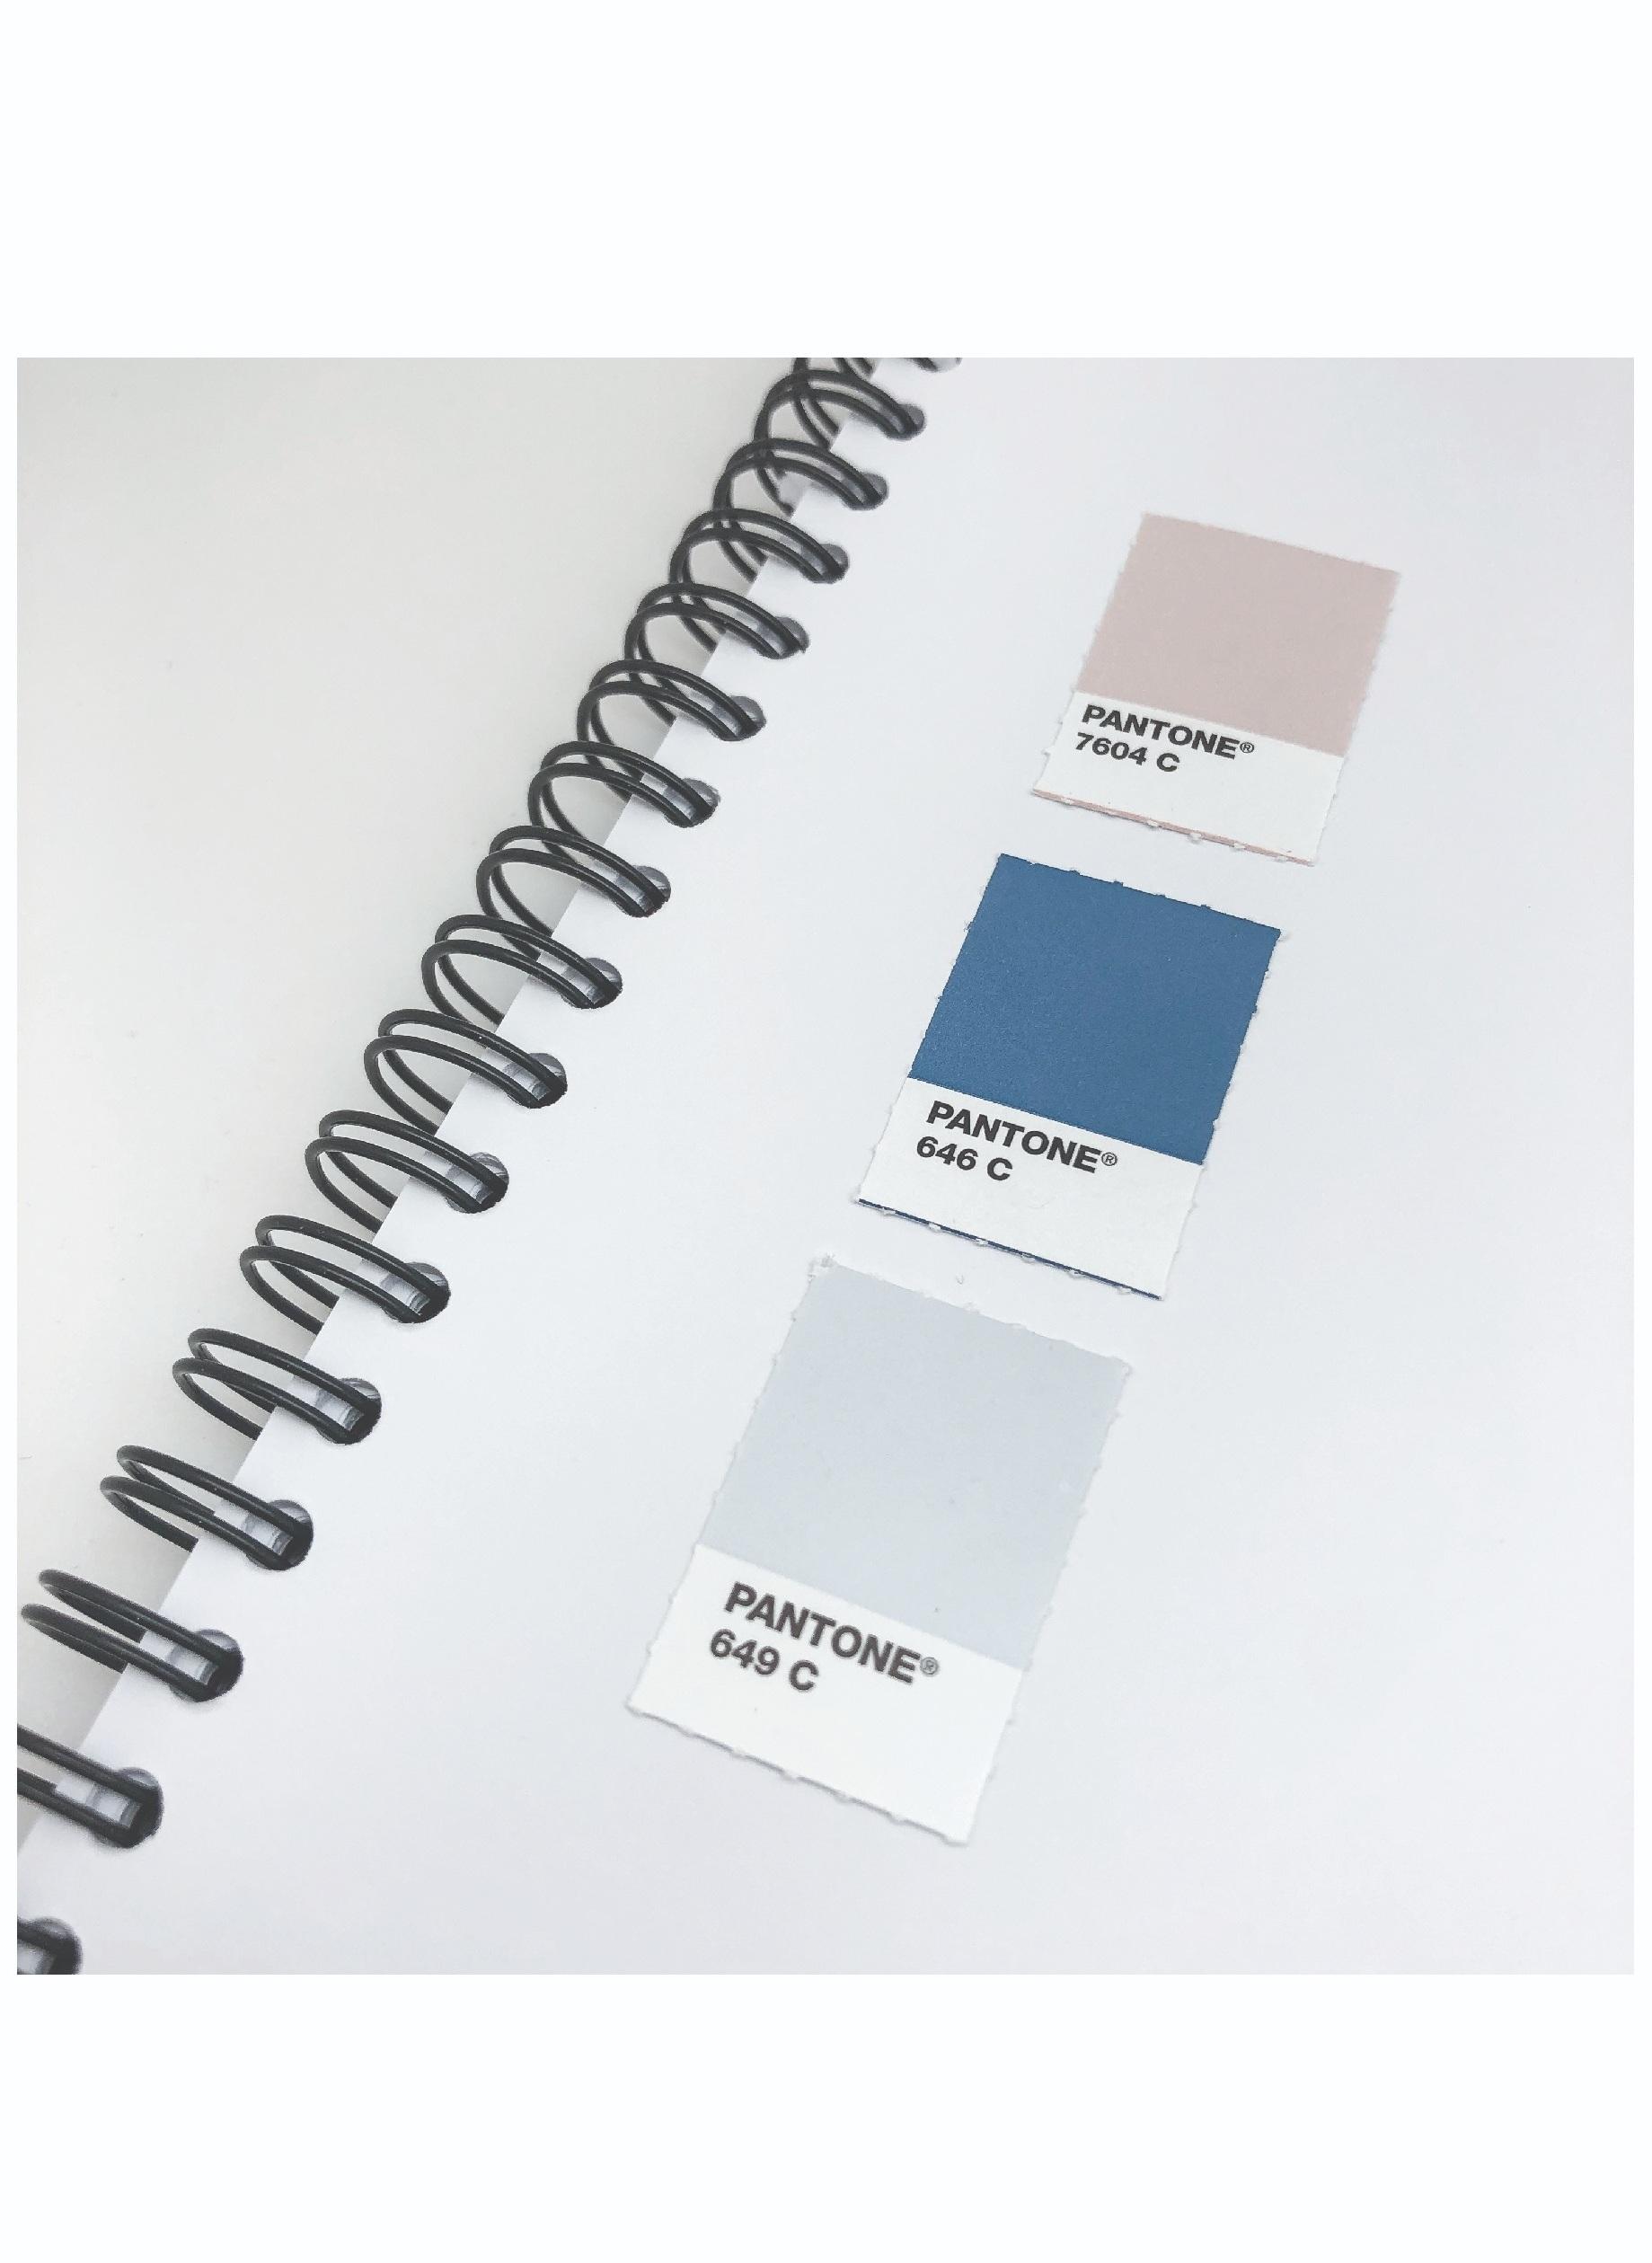 Pantone Color Matching